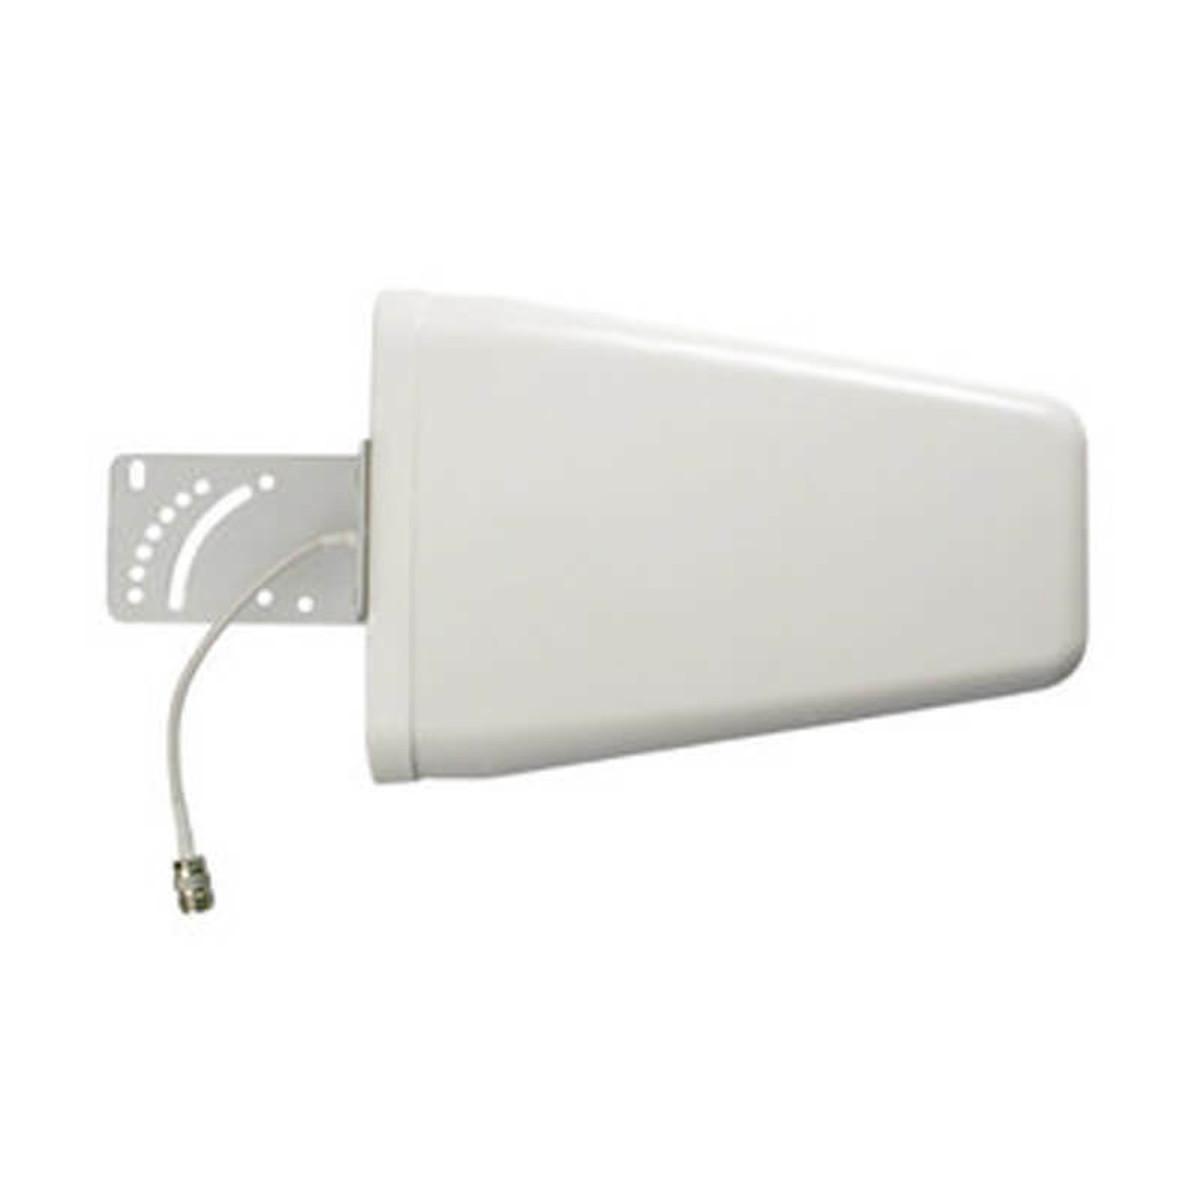 Wilson Electronics Wilson Pro cellular RF Signal Meter Survey Kit - 460118SK1